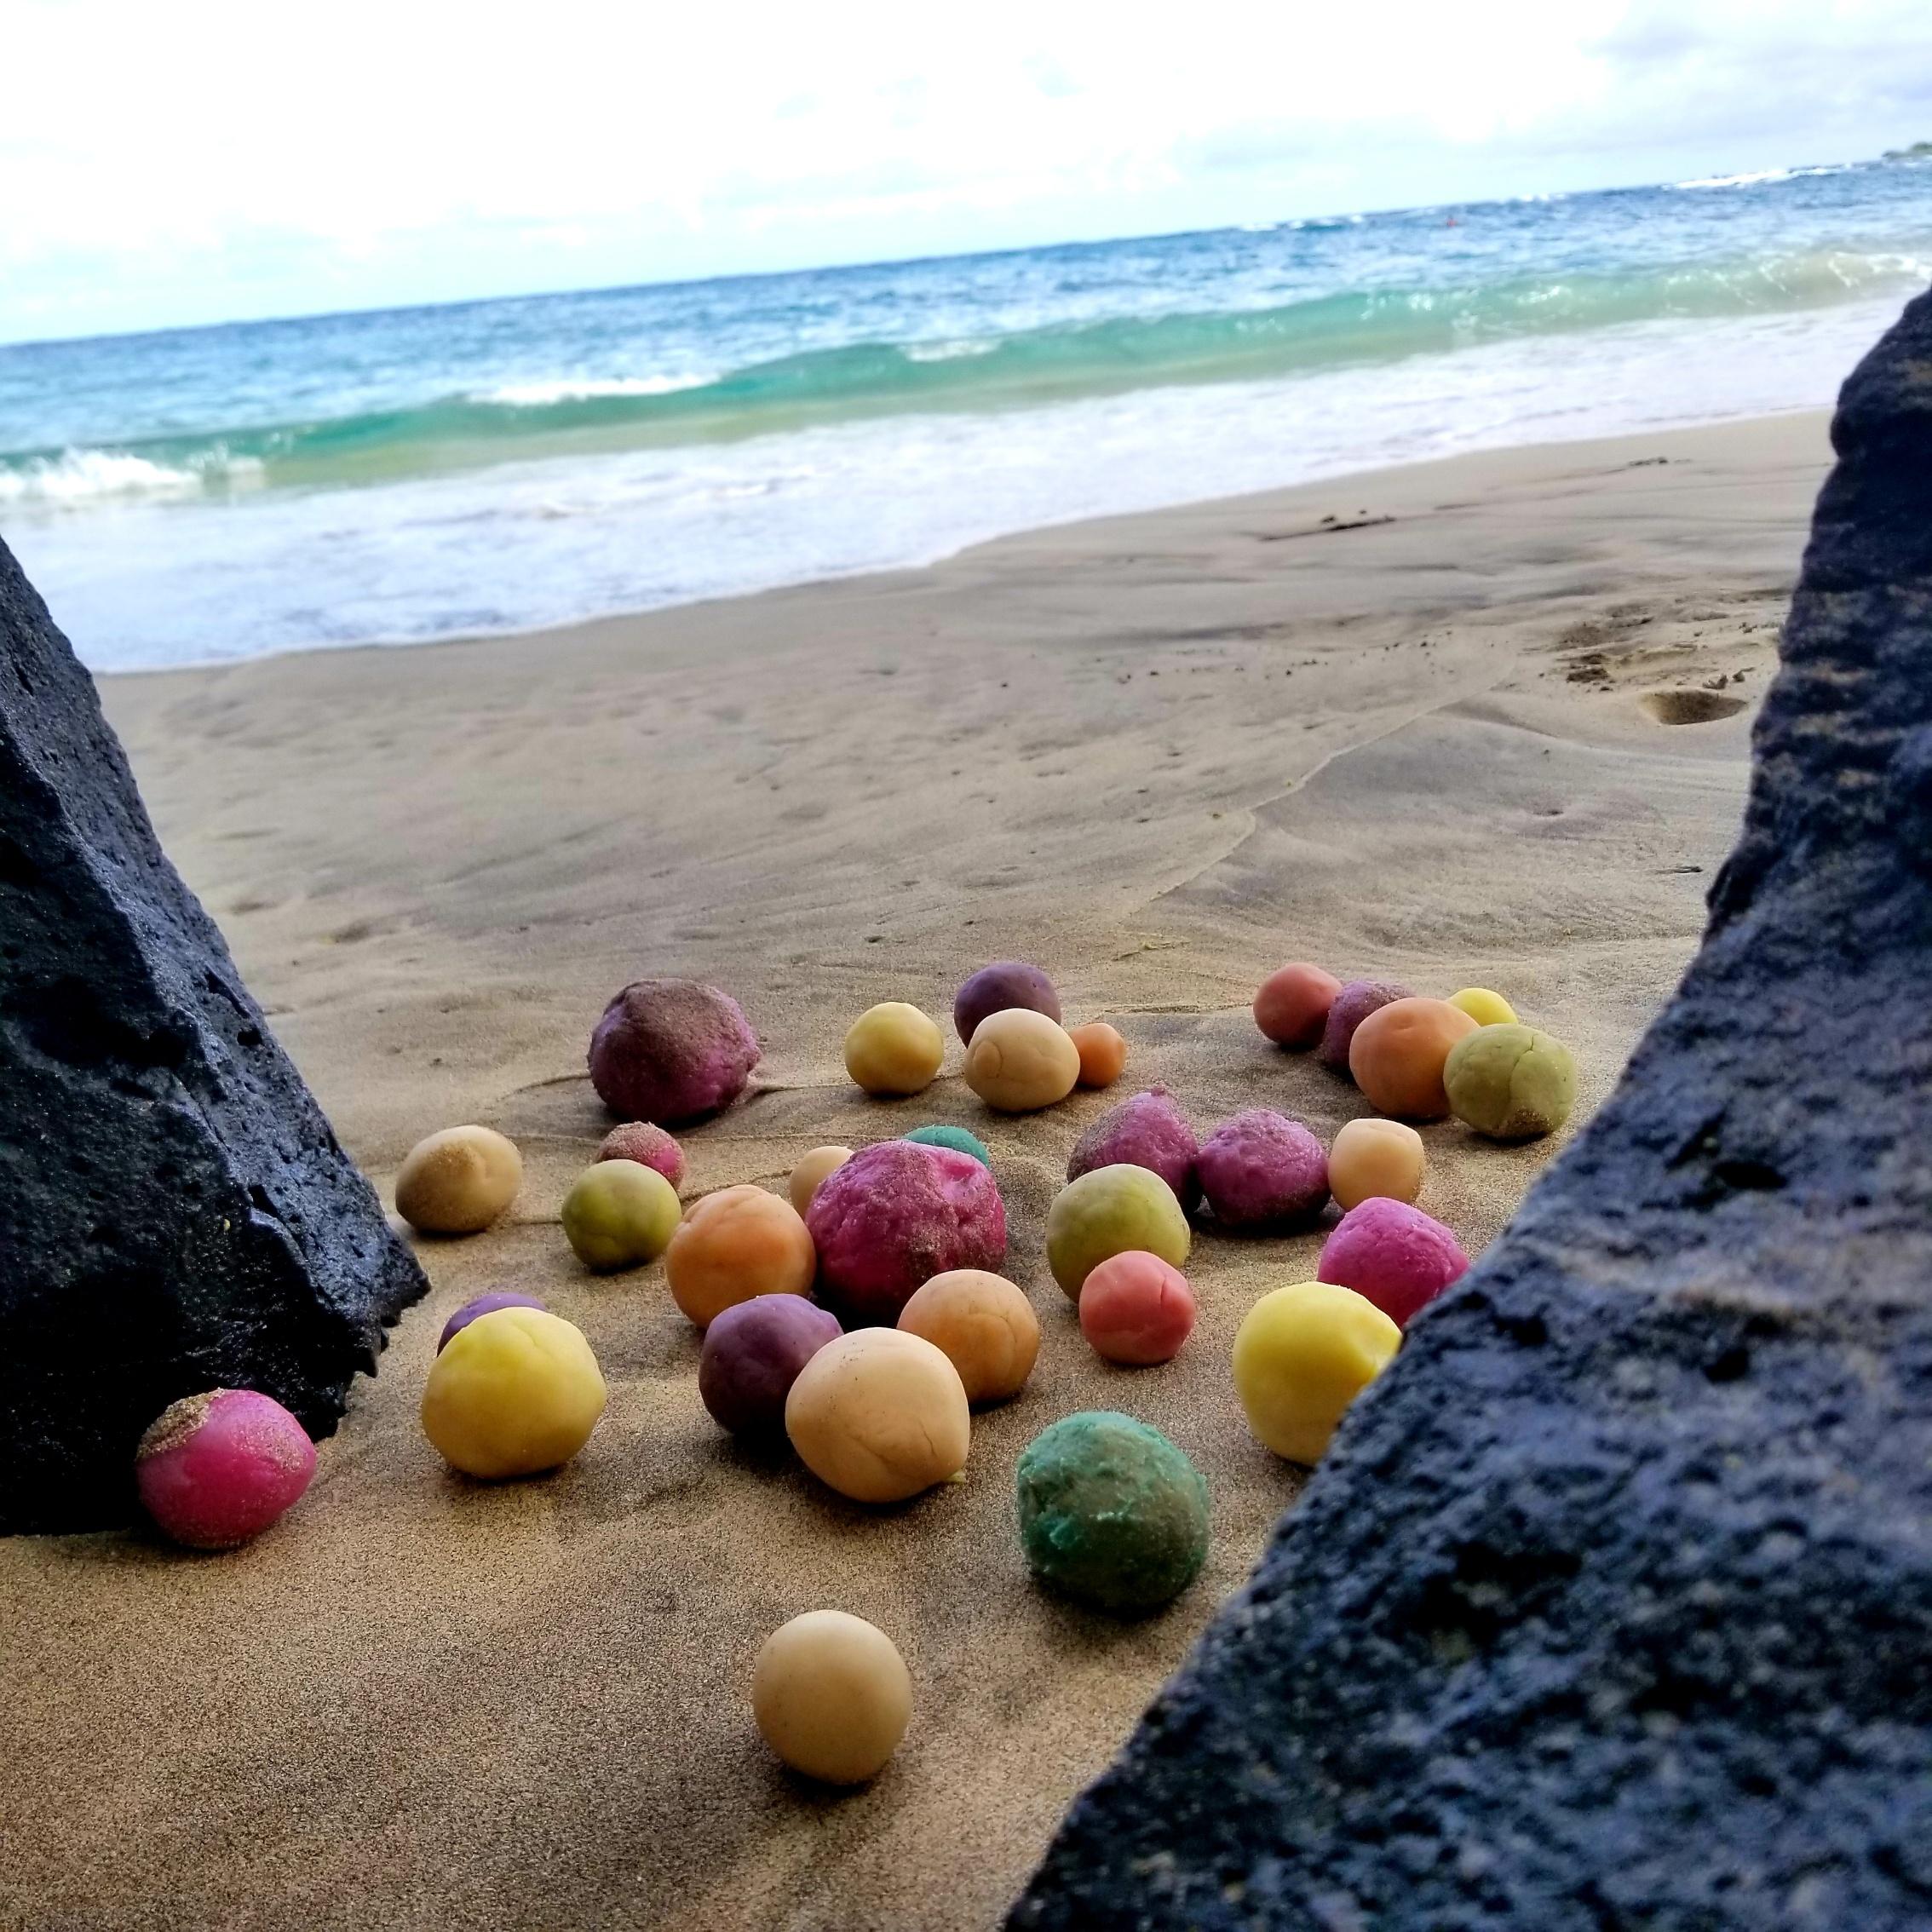 A little sand never hurt. Organic dough on Hamoa Beach, Maui, June 2018.